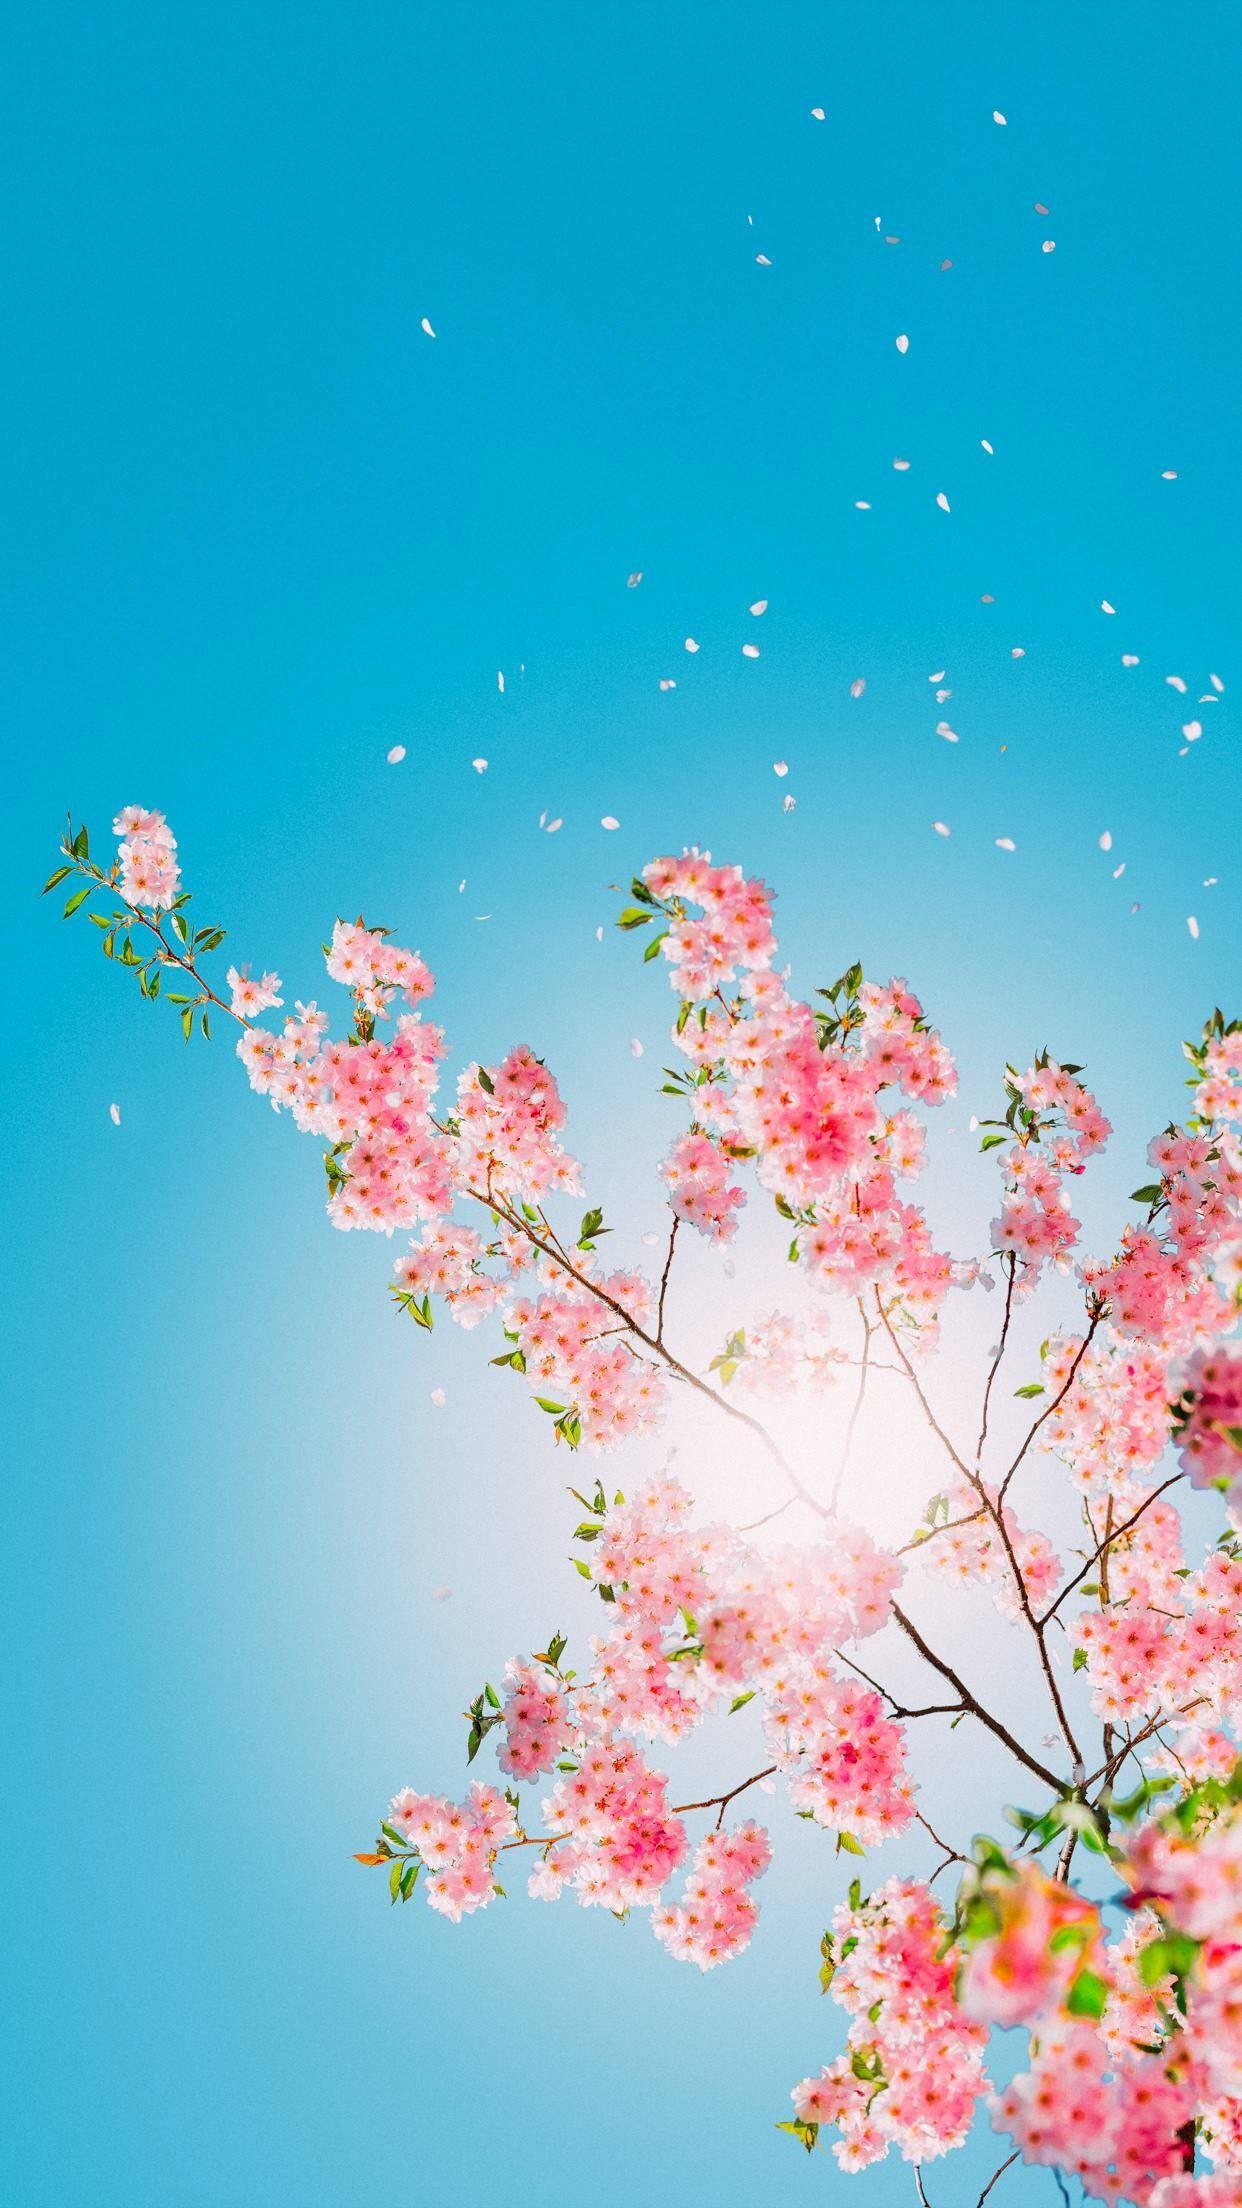 Flower Wallpaper For Iphone Xr 3d Wallpapers Flower Background Wallpaper Flower Iphone Wallpaper Spring Wallpaper